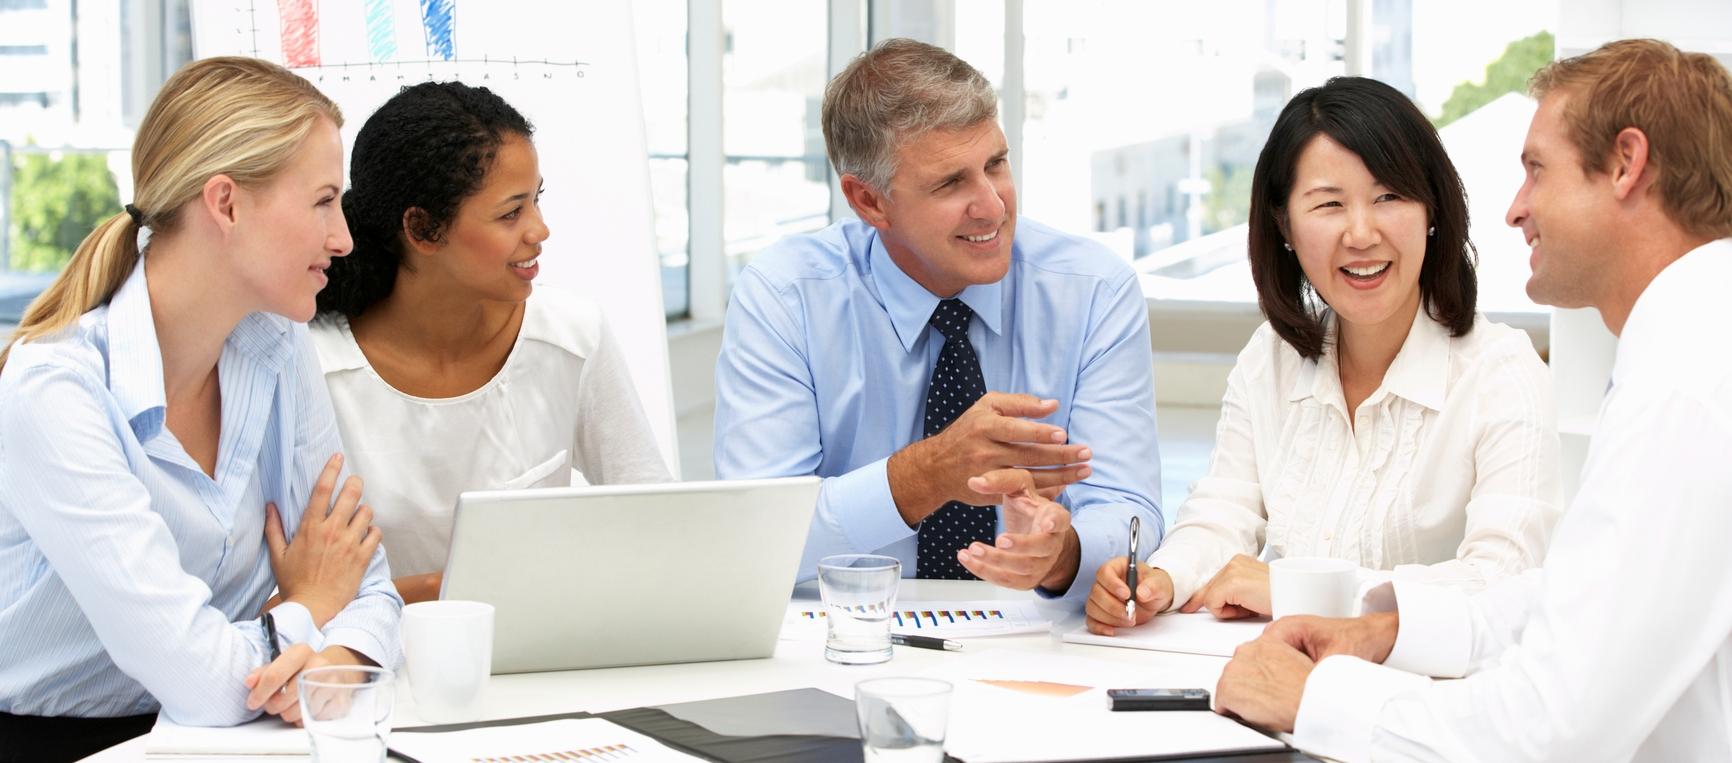 Resume Writing Services, Resume services, Resume writers, Resume writers Australia